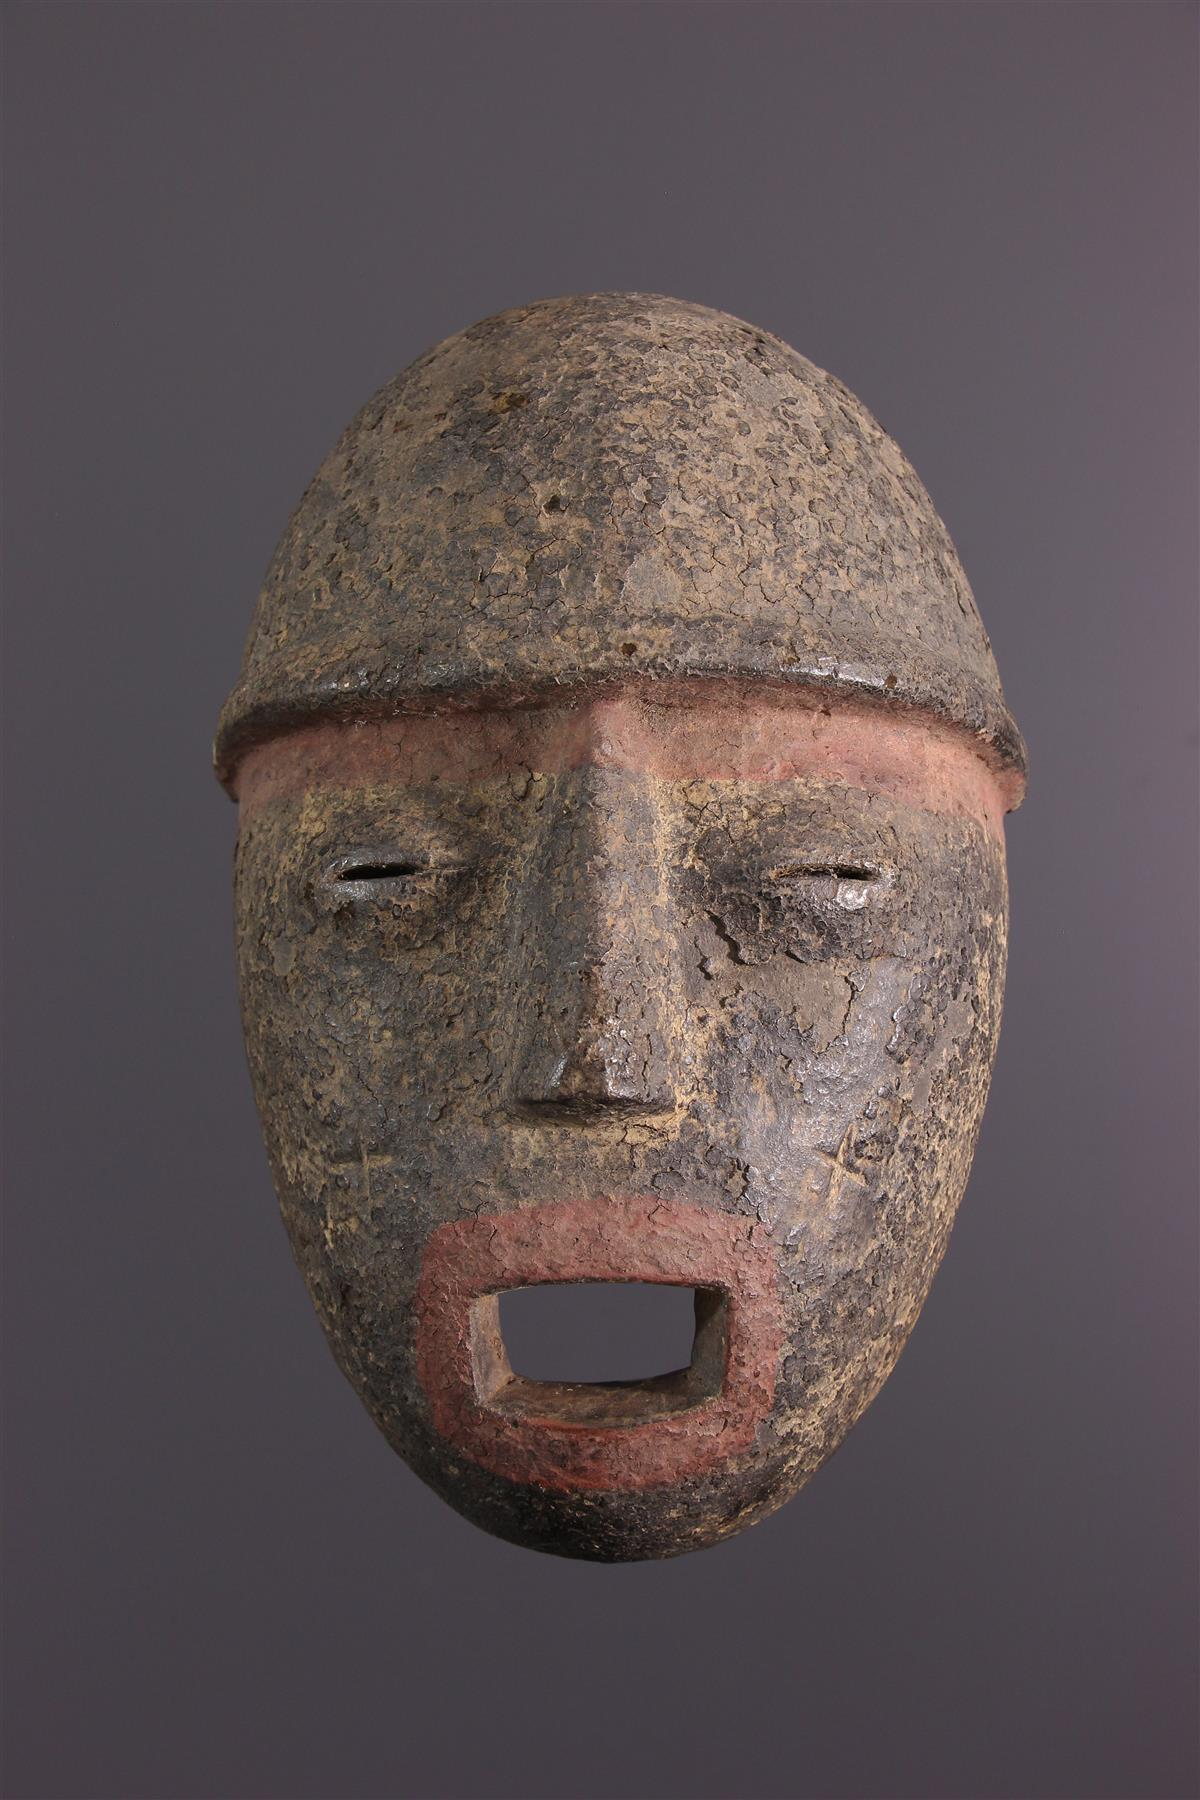 Luvale Mask - Tribal art